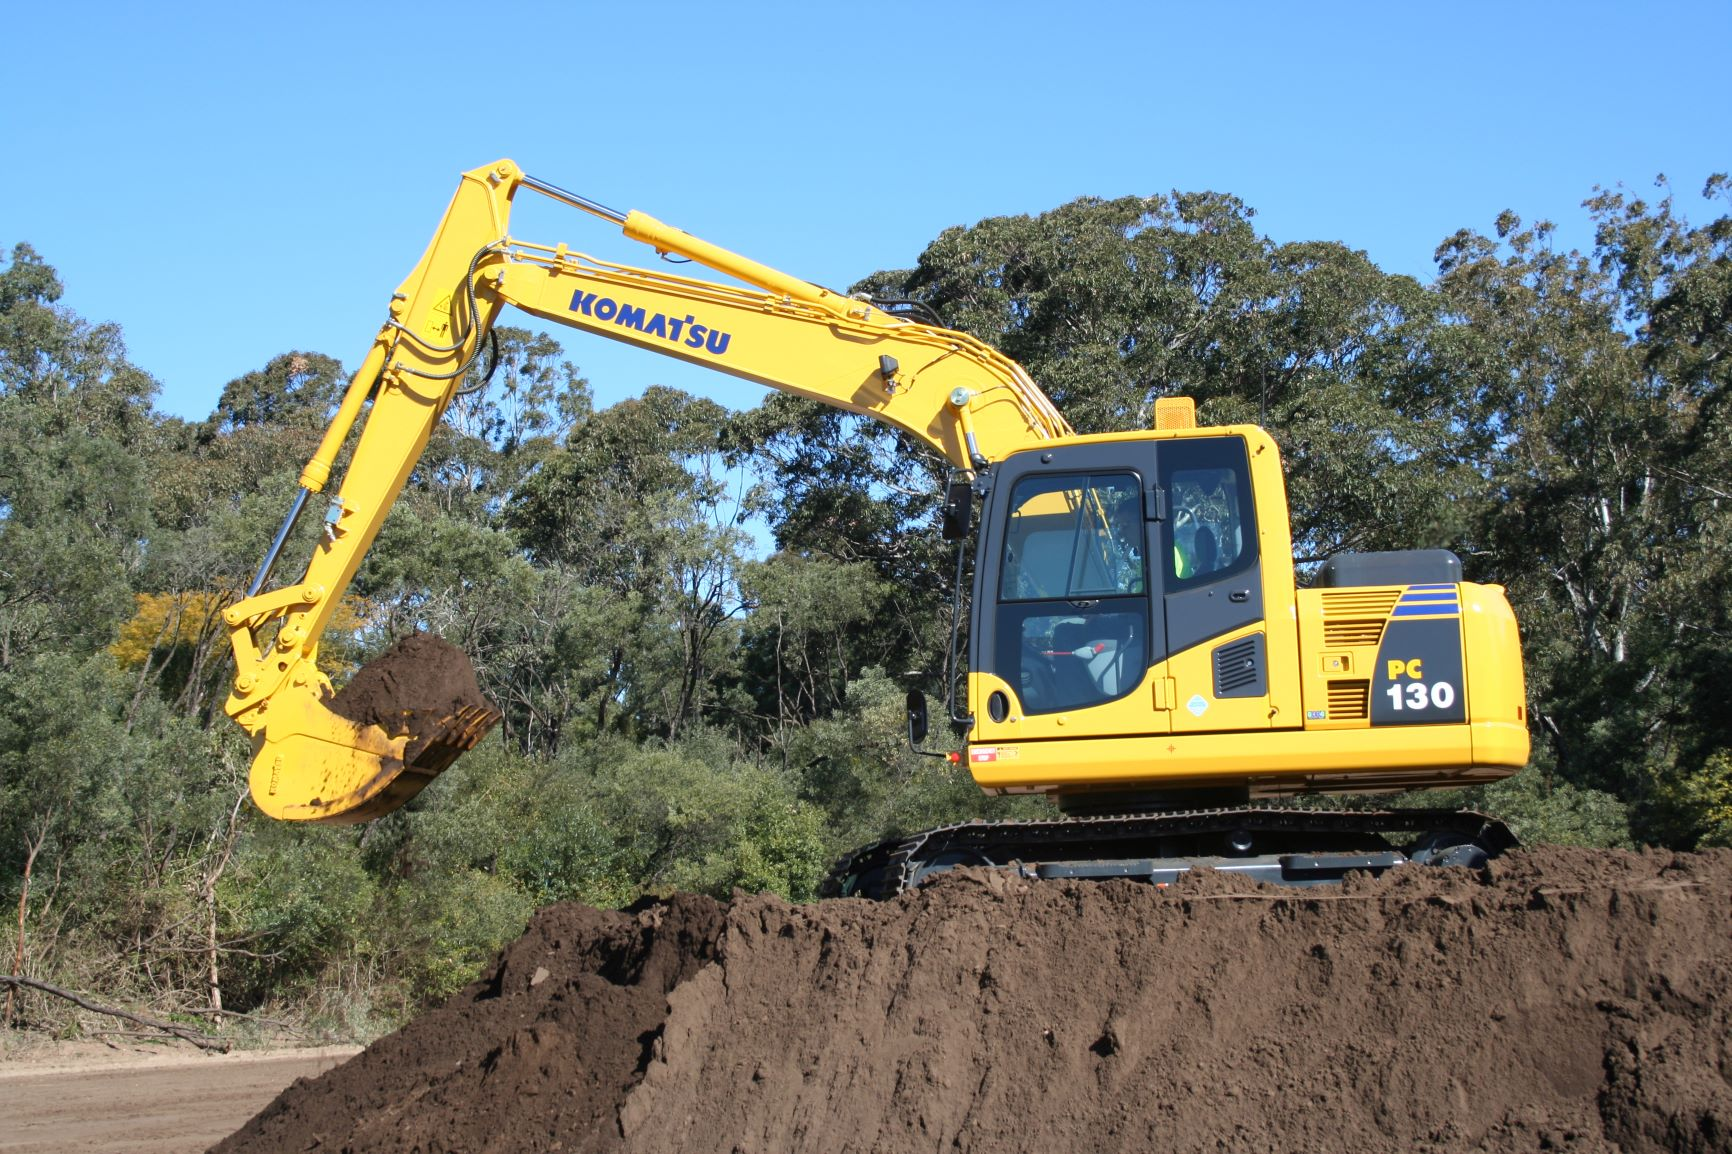 Komatsu PC 130-8 Excavator